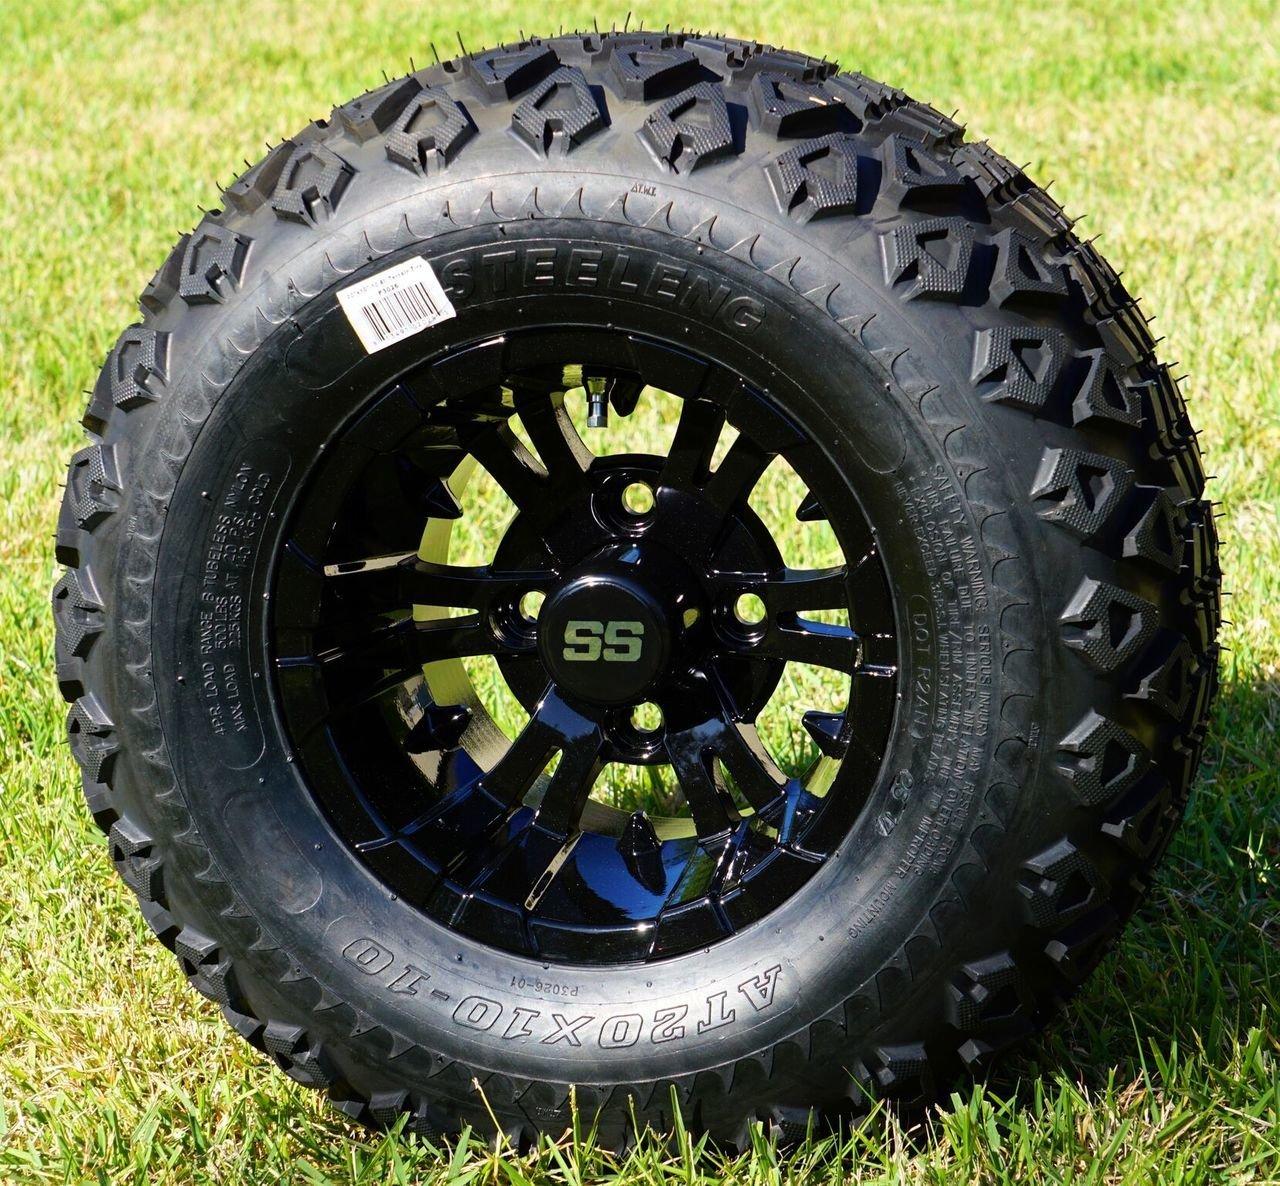 10 Vampire Gloss Black Wheels And 20x10 10 Dot All Terrain Tires